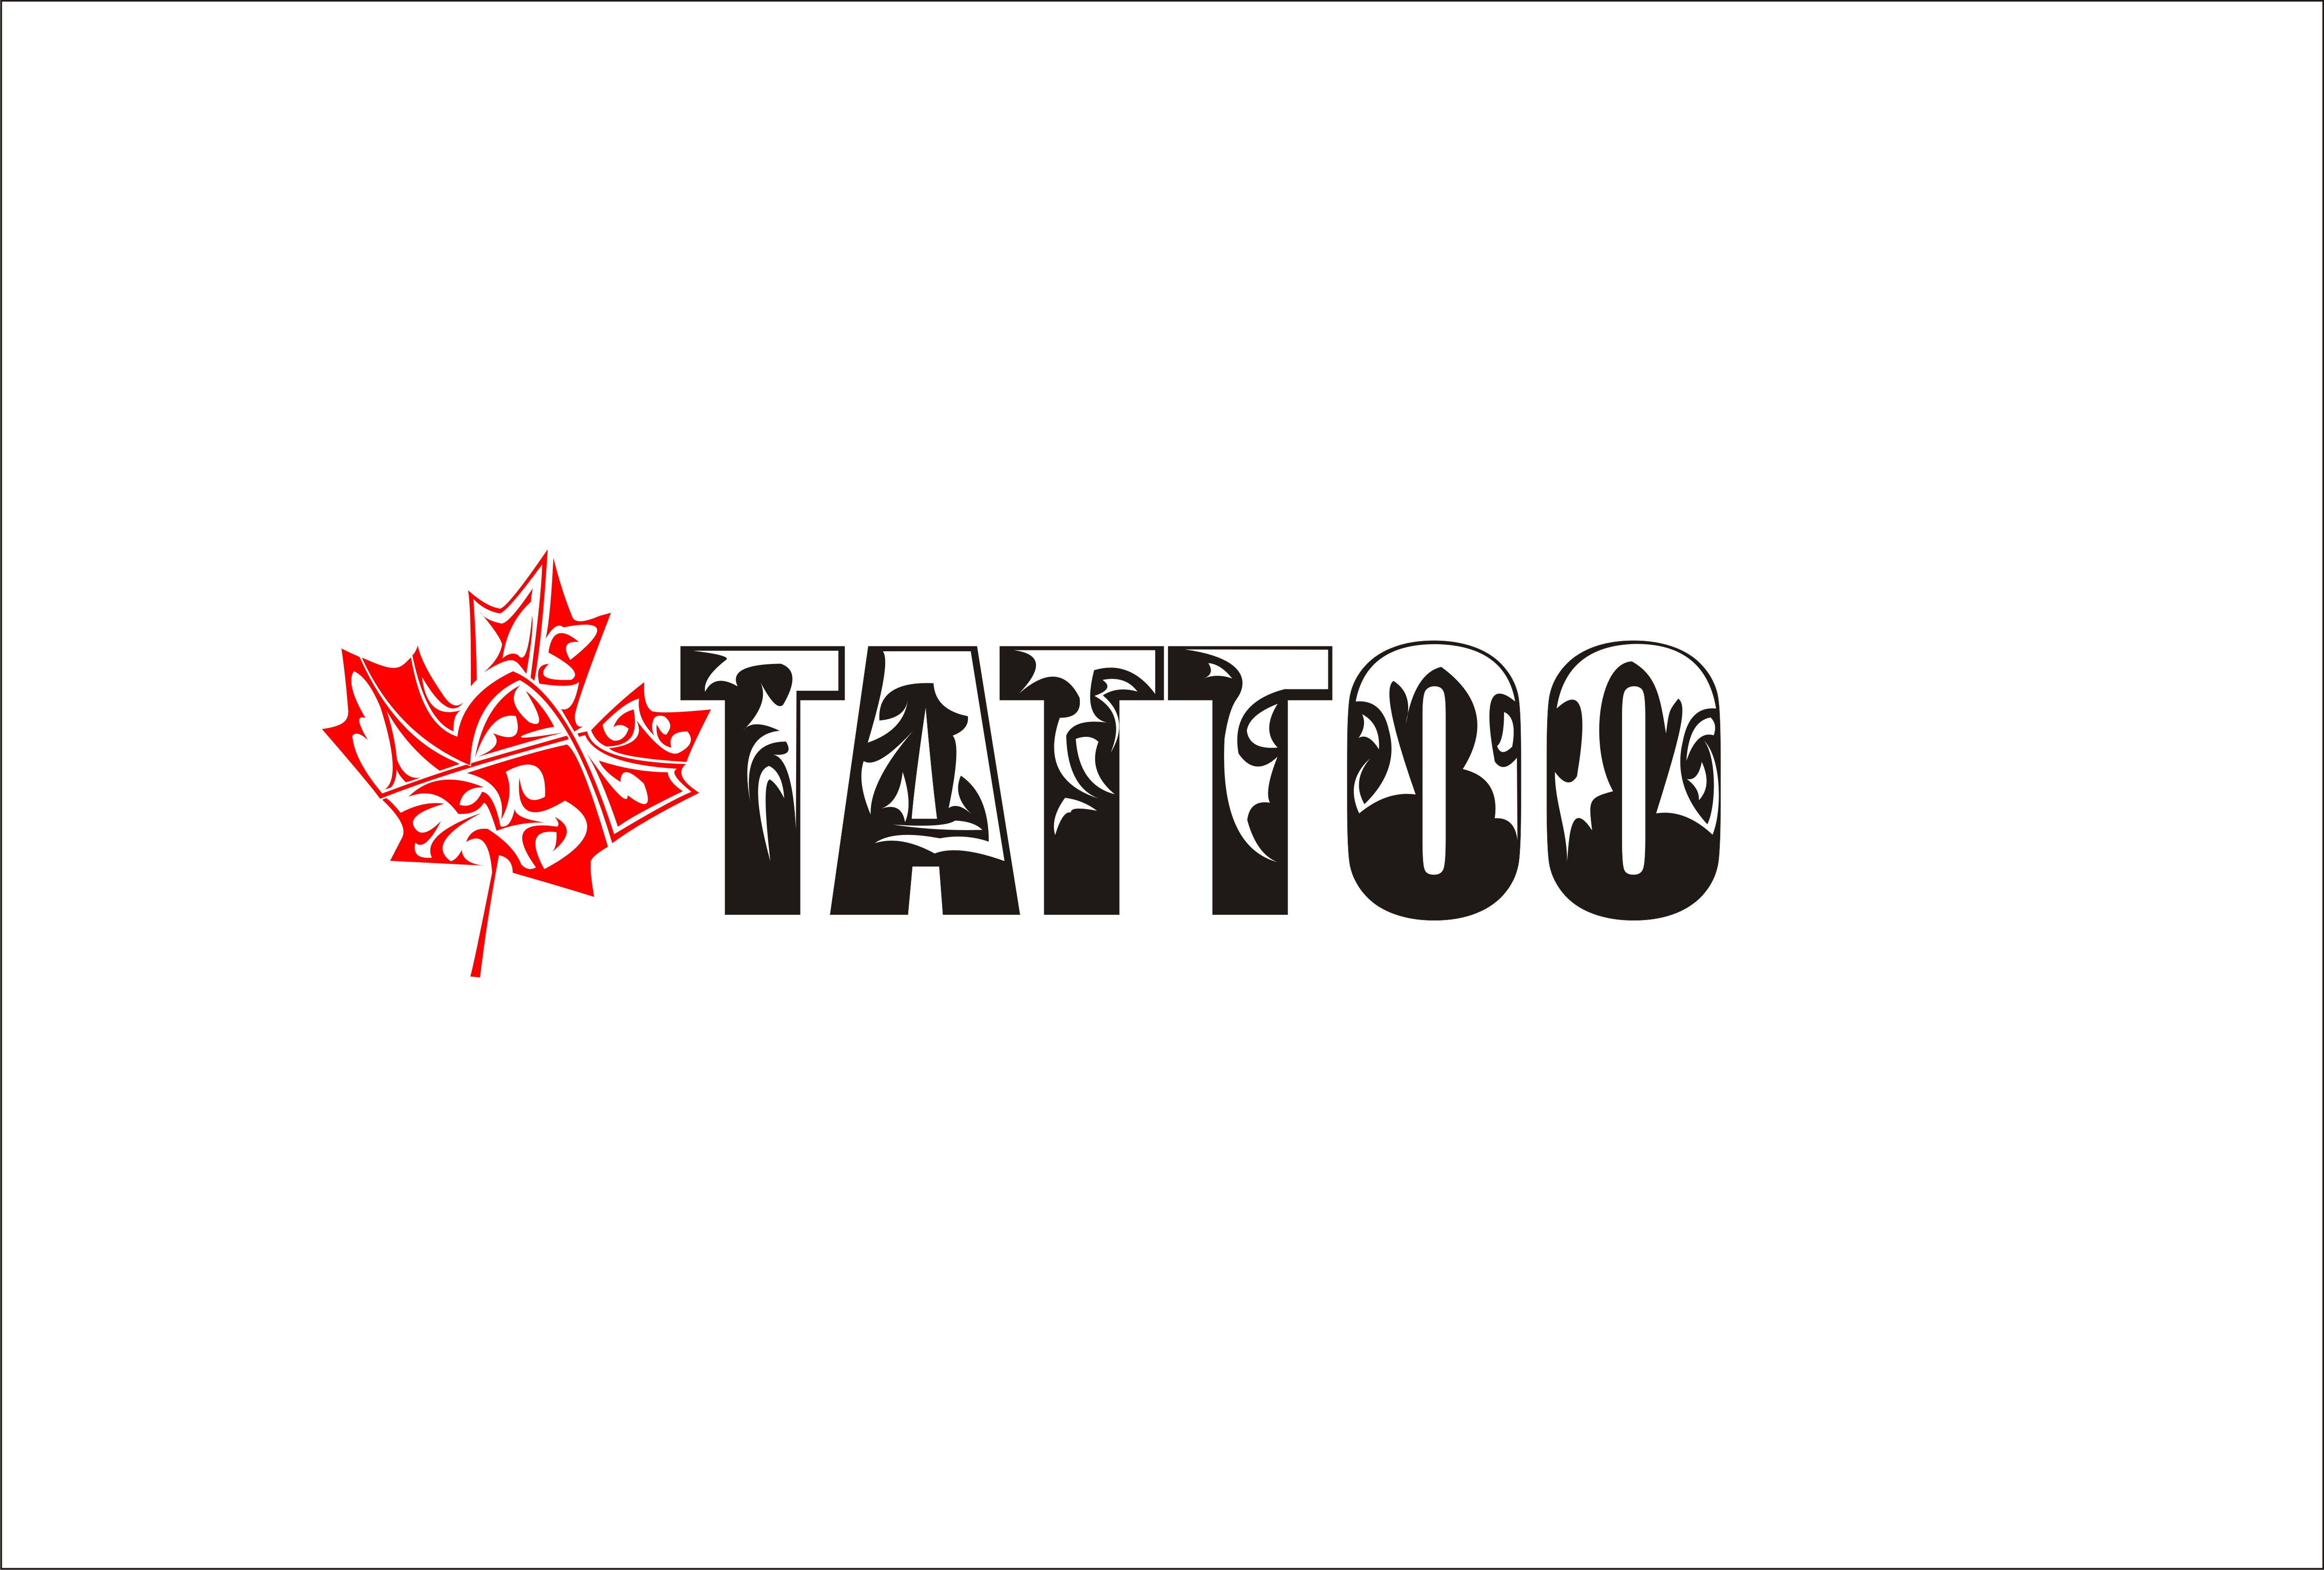 Logo Design by Kostas Vasiloglou - Entry No. 81 in the Logo Design Contest Artistic Logo Design for Tattoo Luggage Company.